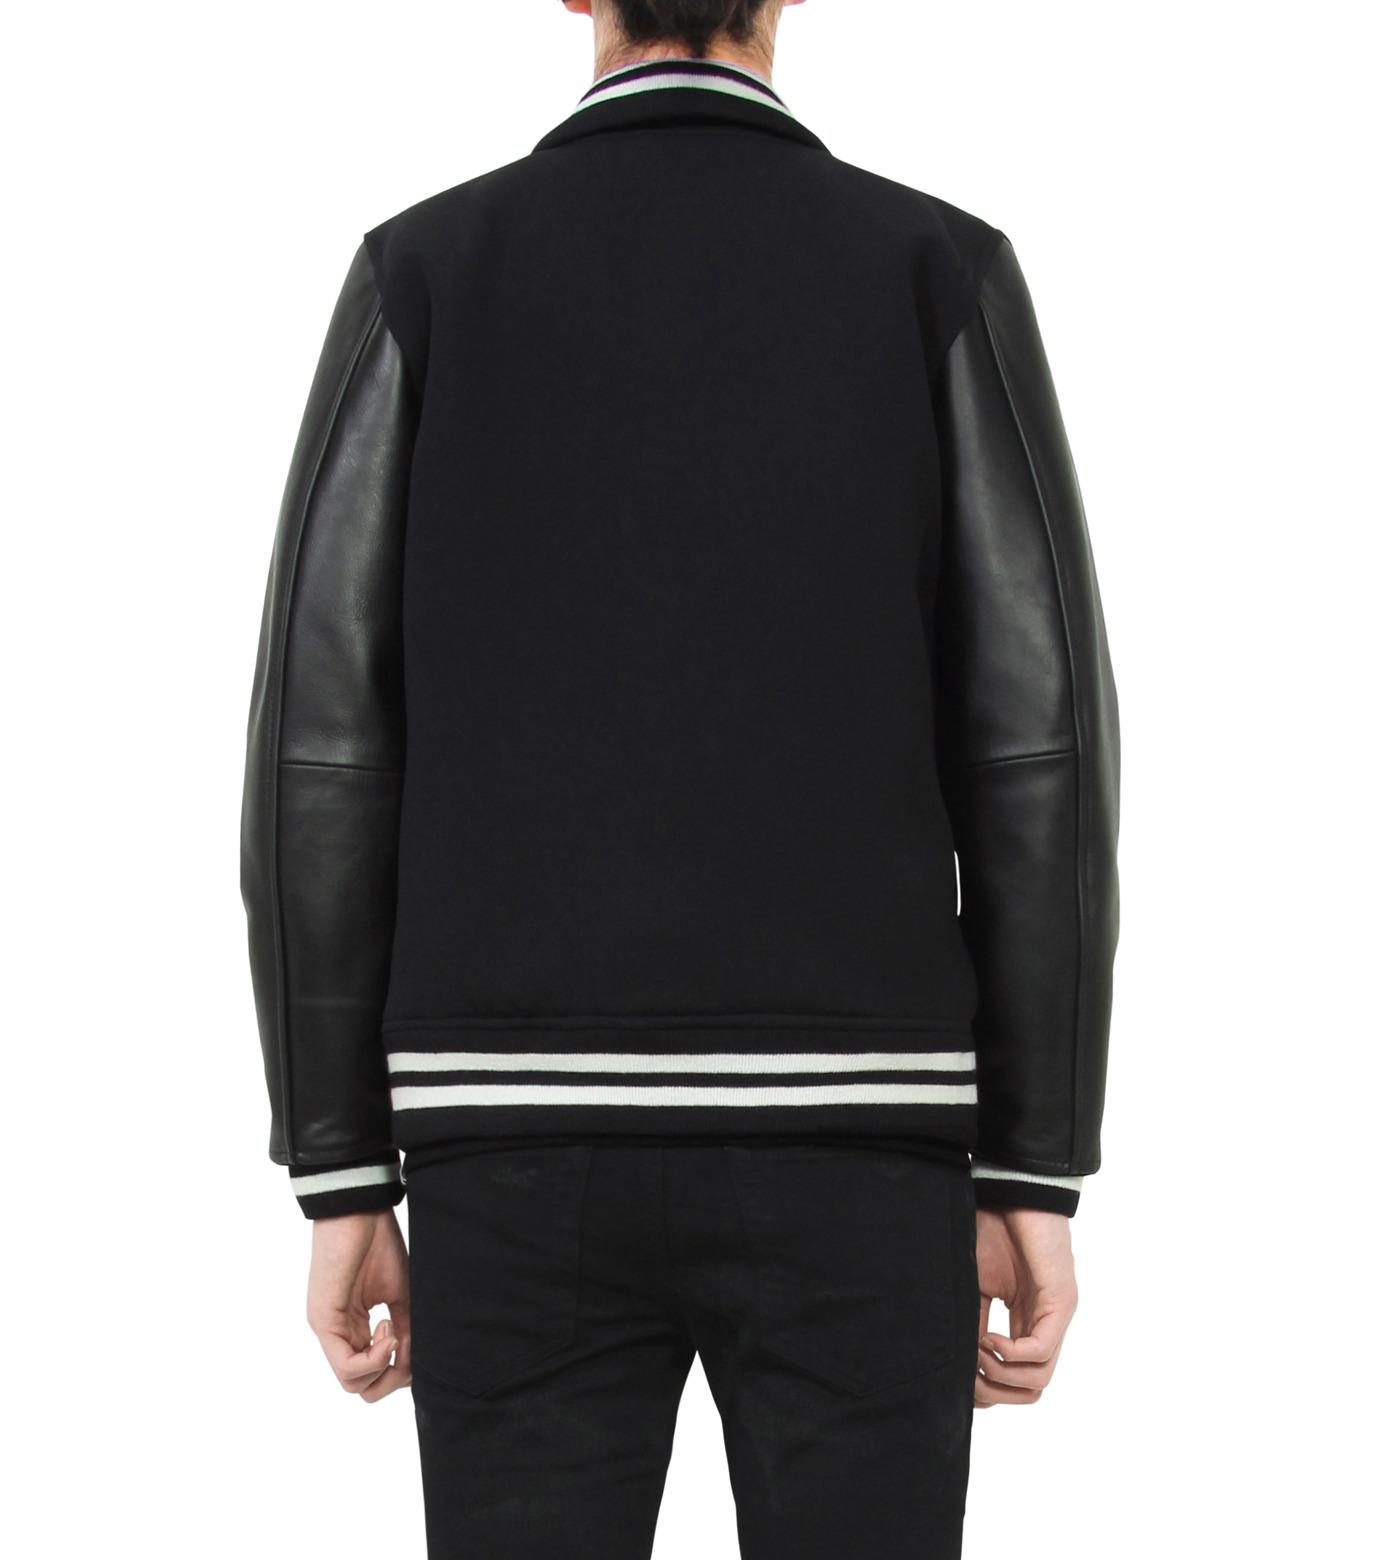 HL HEDDIE LOVU(エイチエル・エディールーヴ)のSTADIUM JACKET-BLACK(ジャケット/jacket)-18S94002-13 拡大詳細画像2